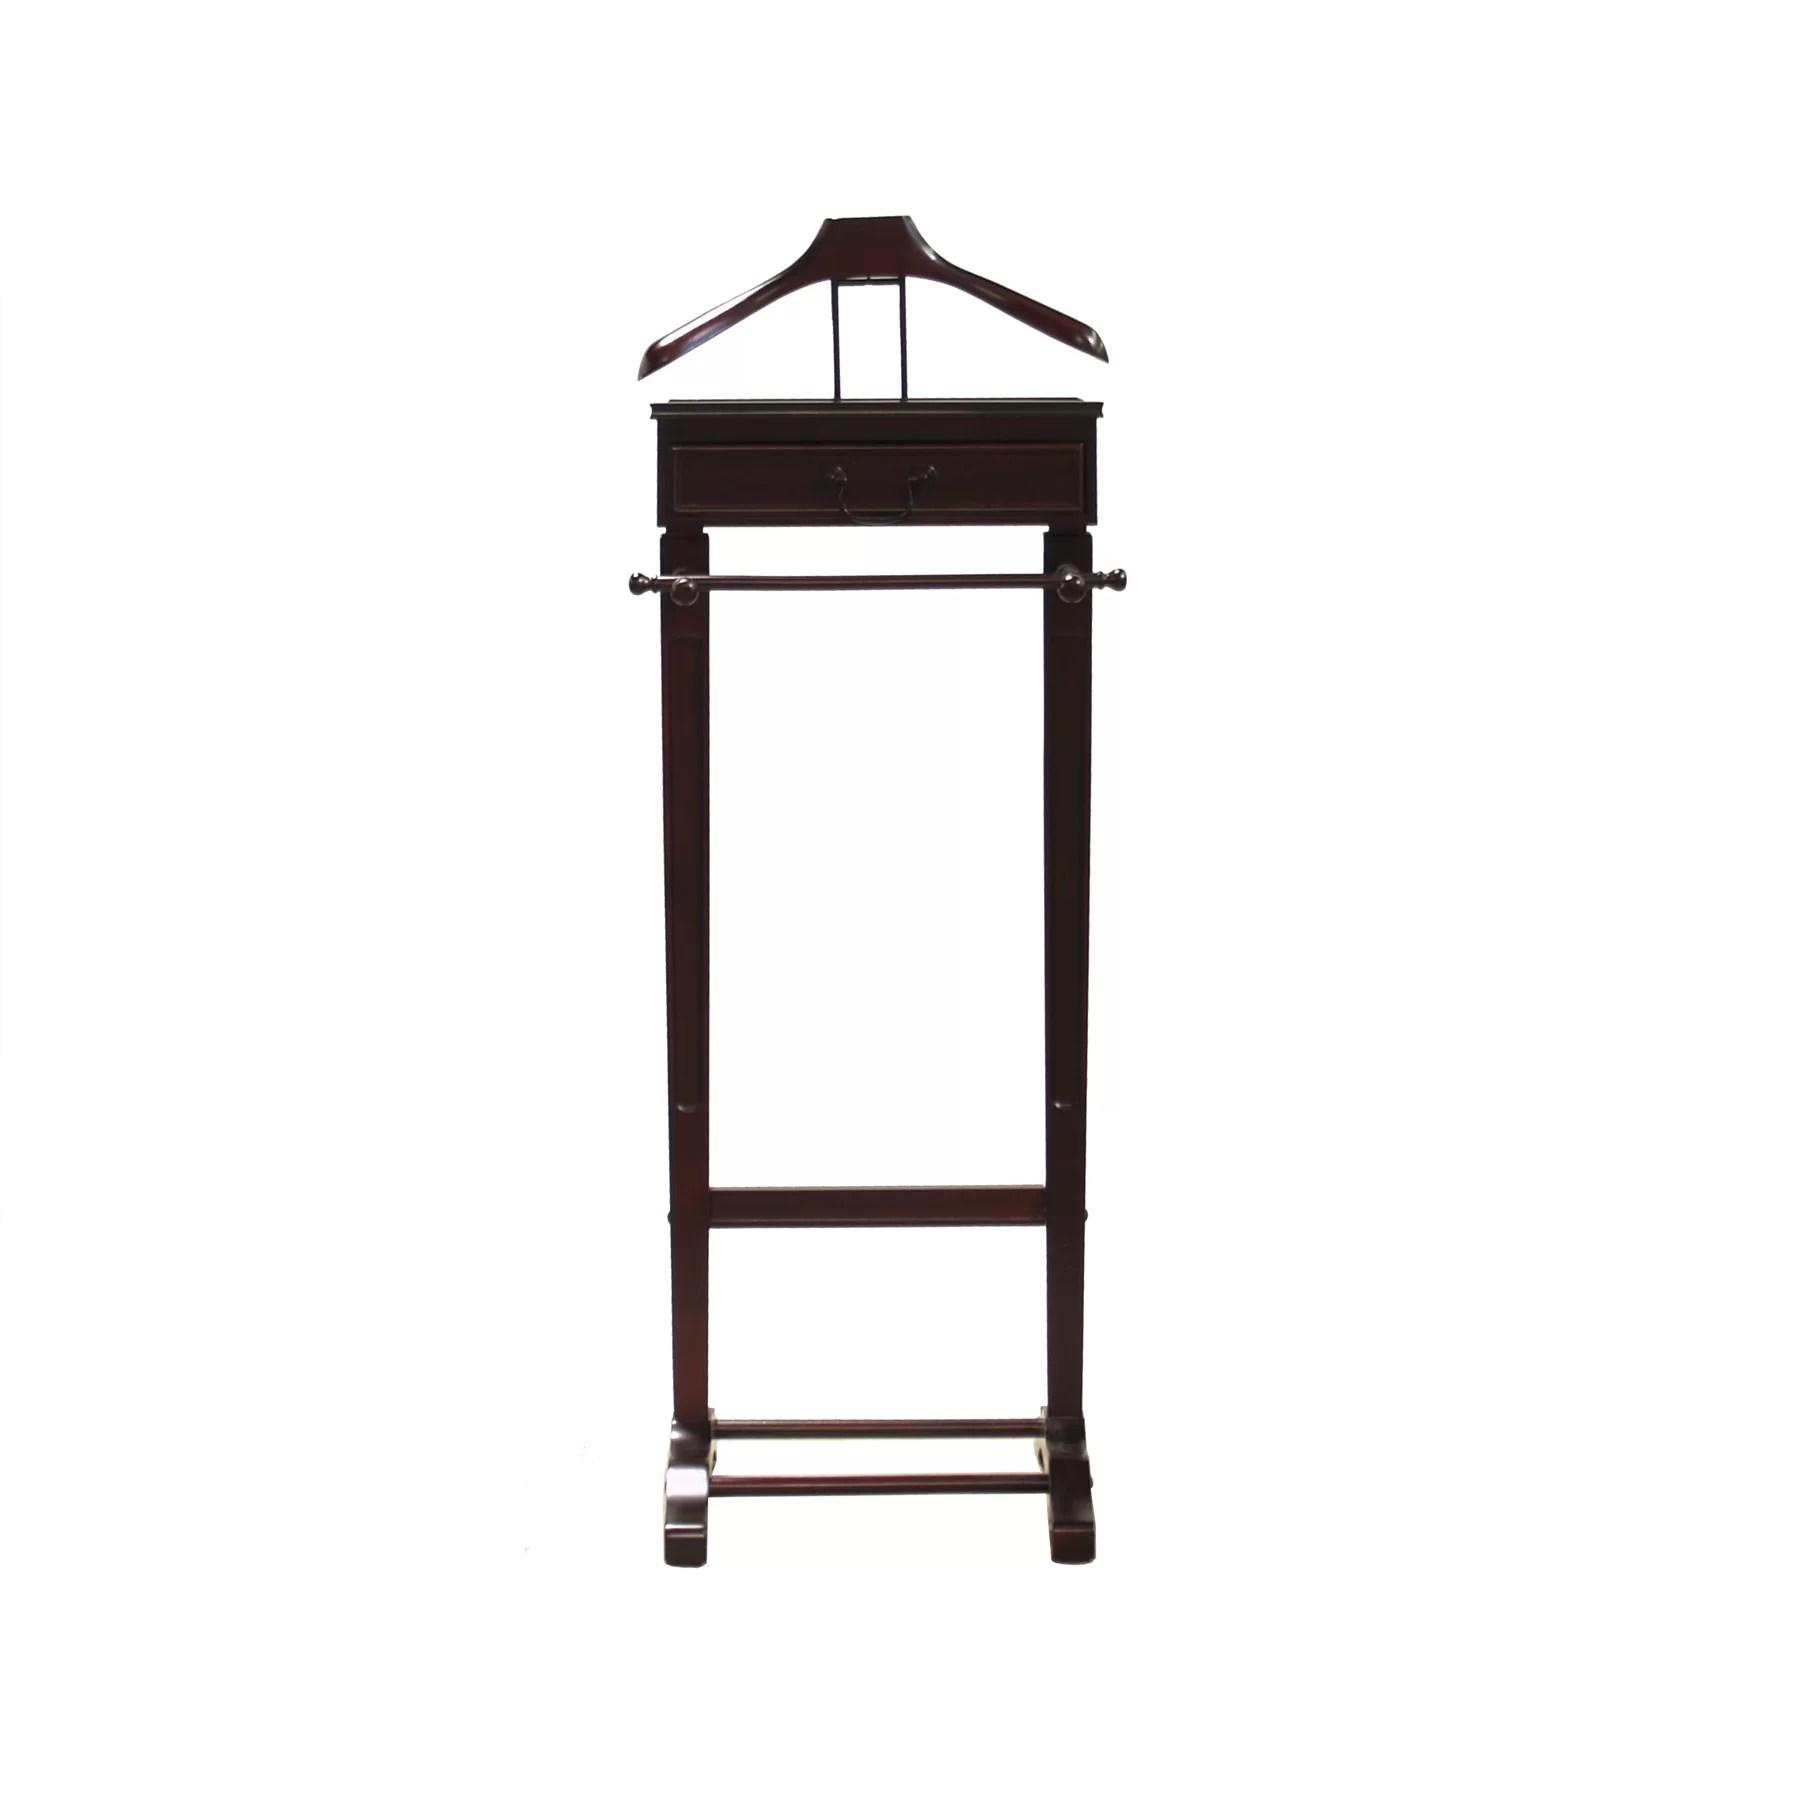 bedroom wardrobe chair valet desk amazon uk three posts lebanon and reviews wayfair